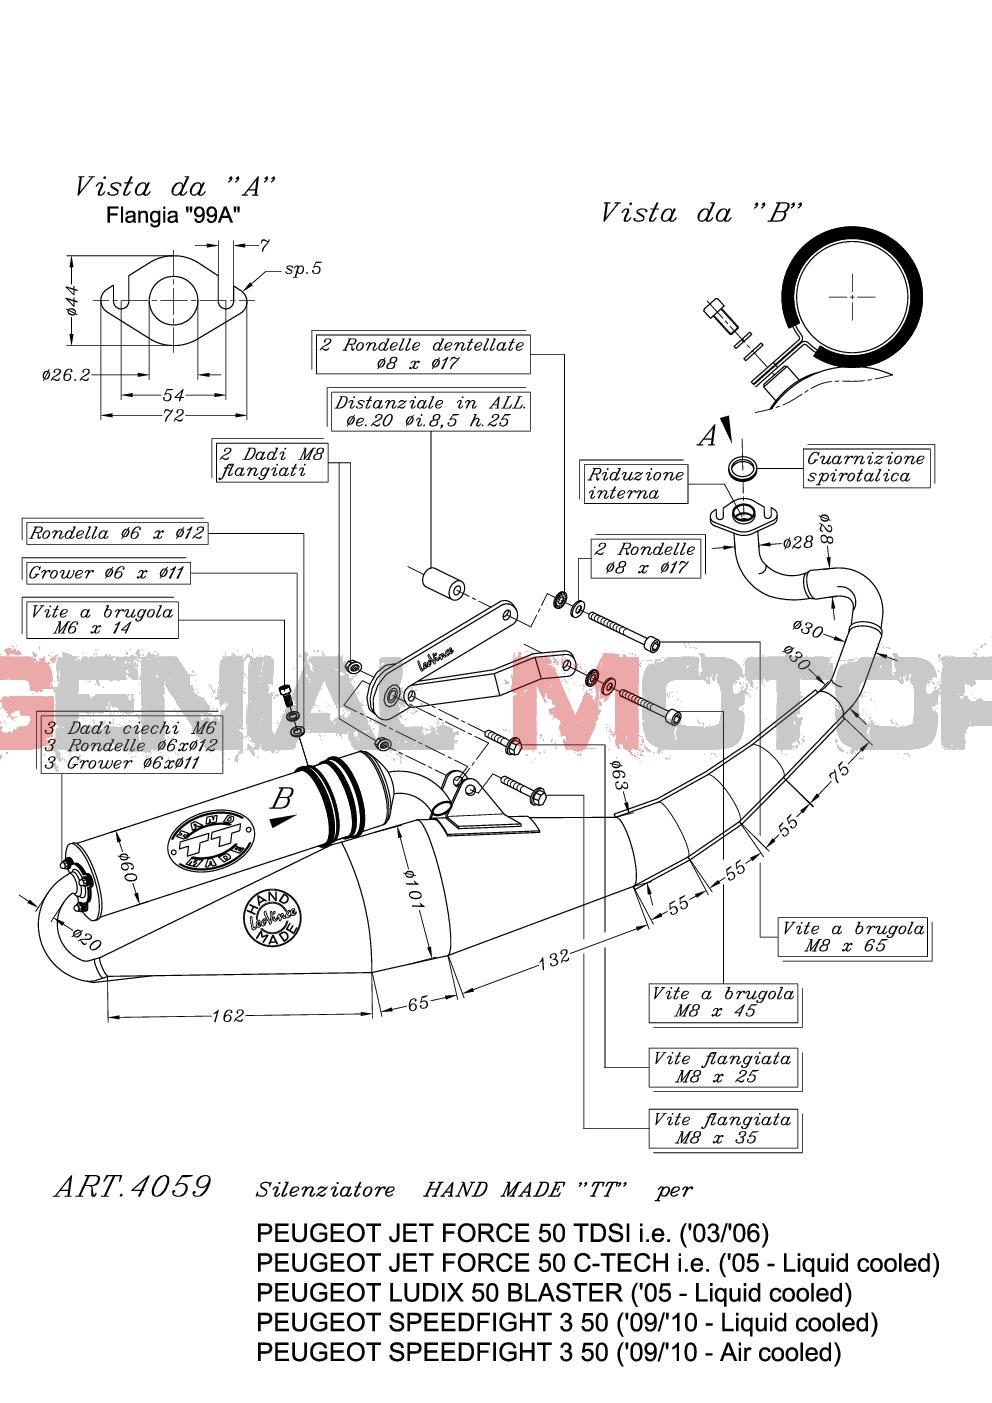 4059 Echappement Complete Leovince HM Tt Alu Peugeot Ludix Blaster 50 2005 > 2006